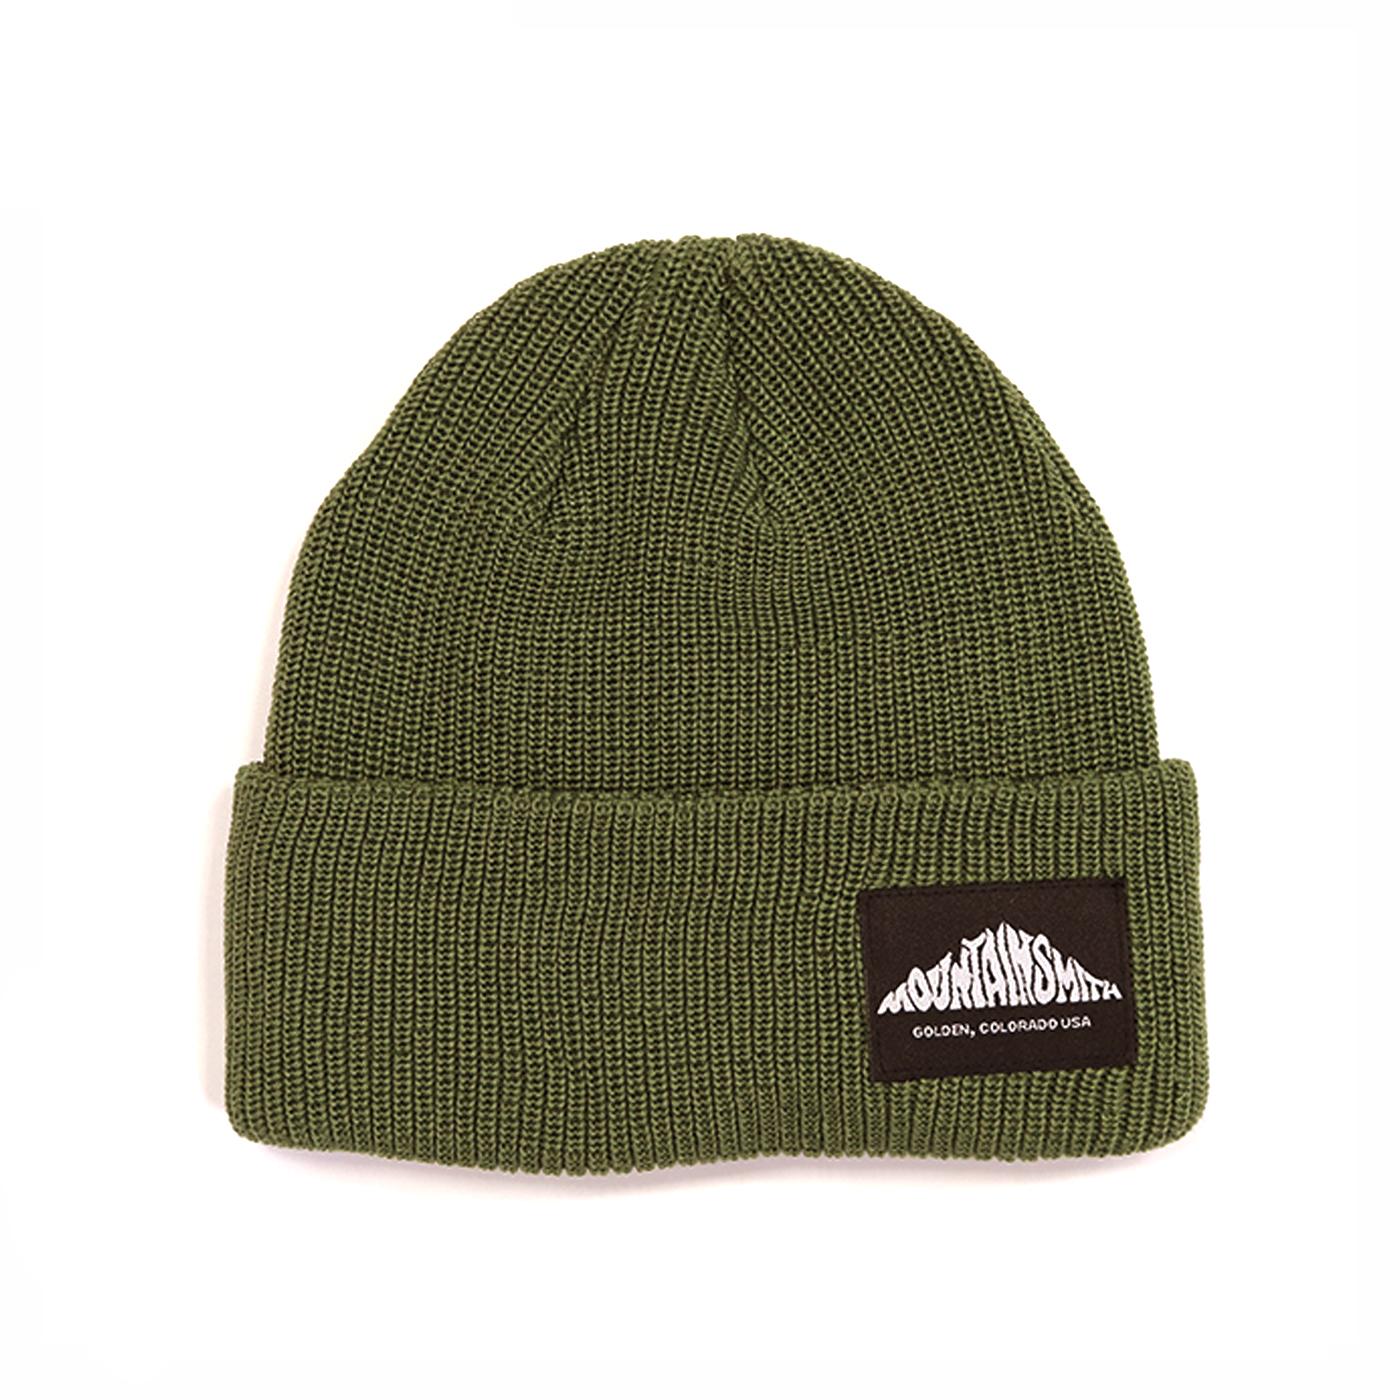 product: LOGO KNIT CAP / color: KHAKI 1